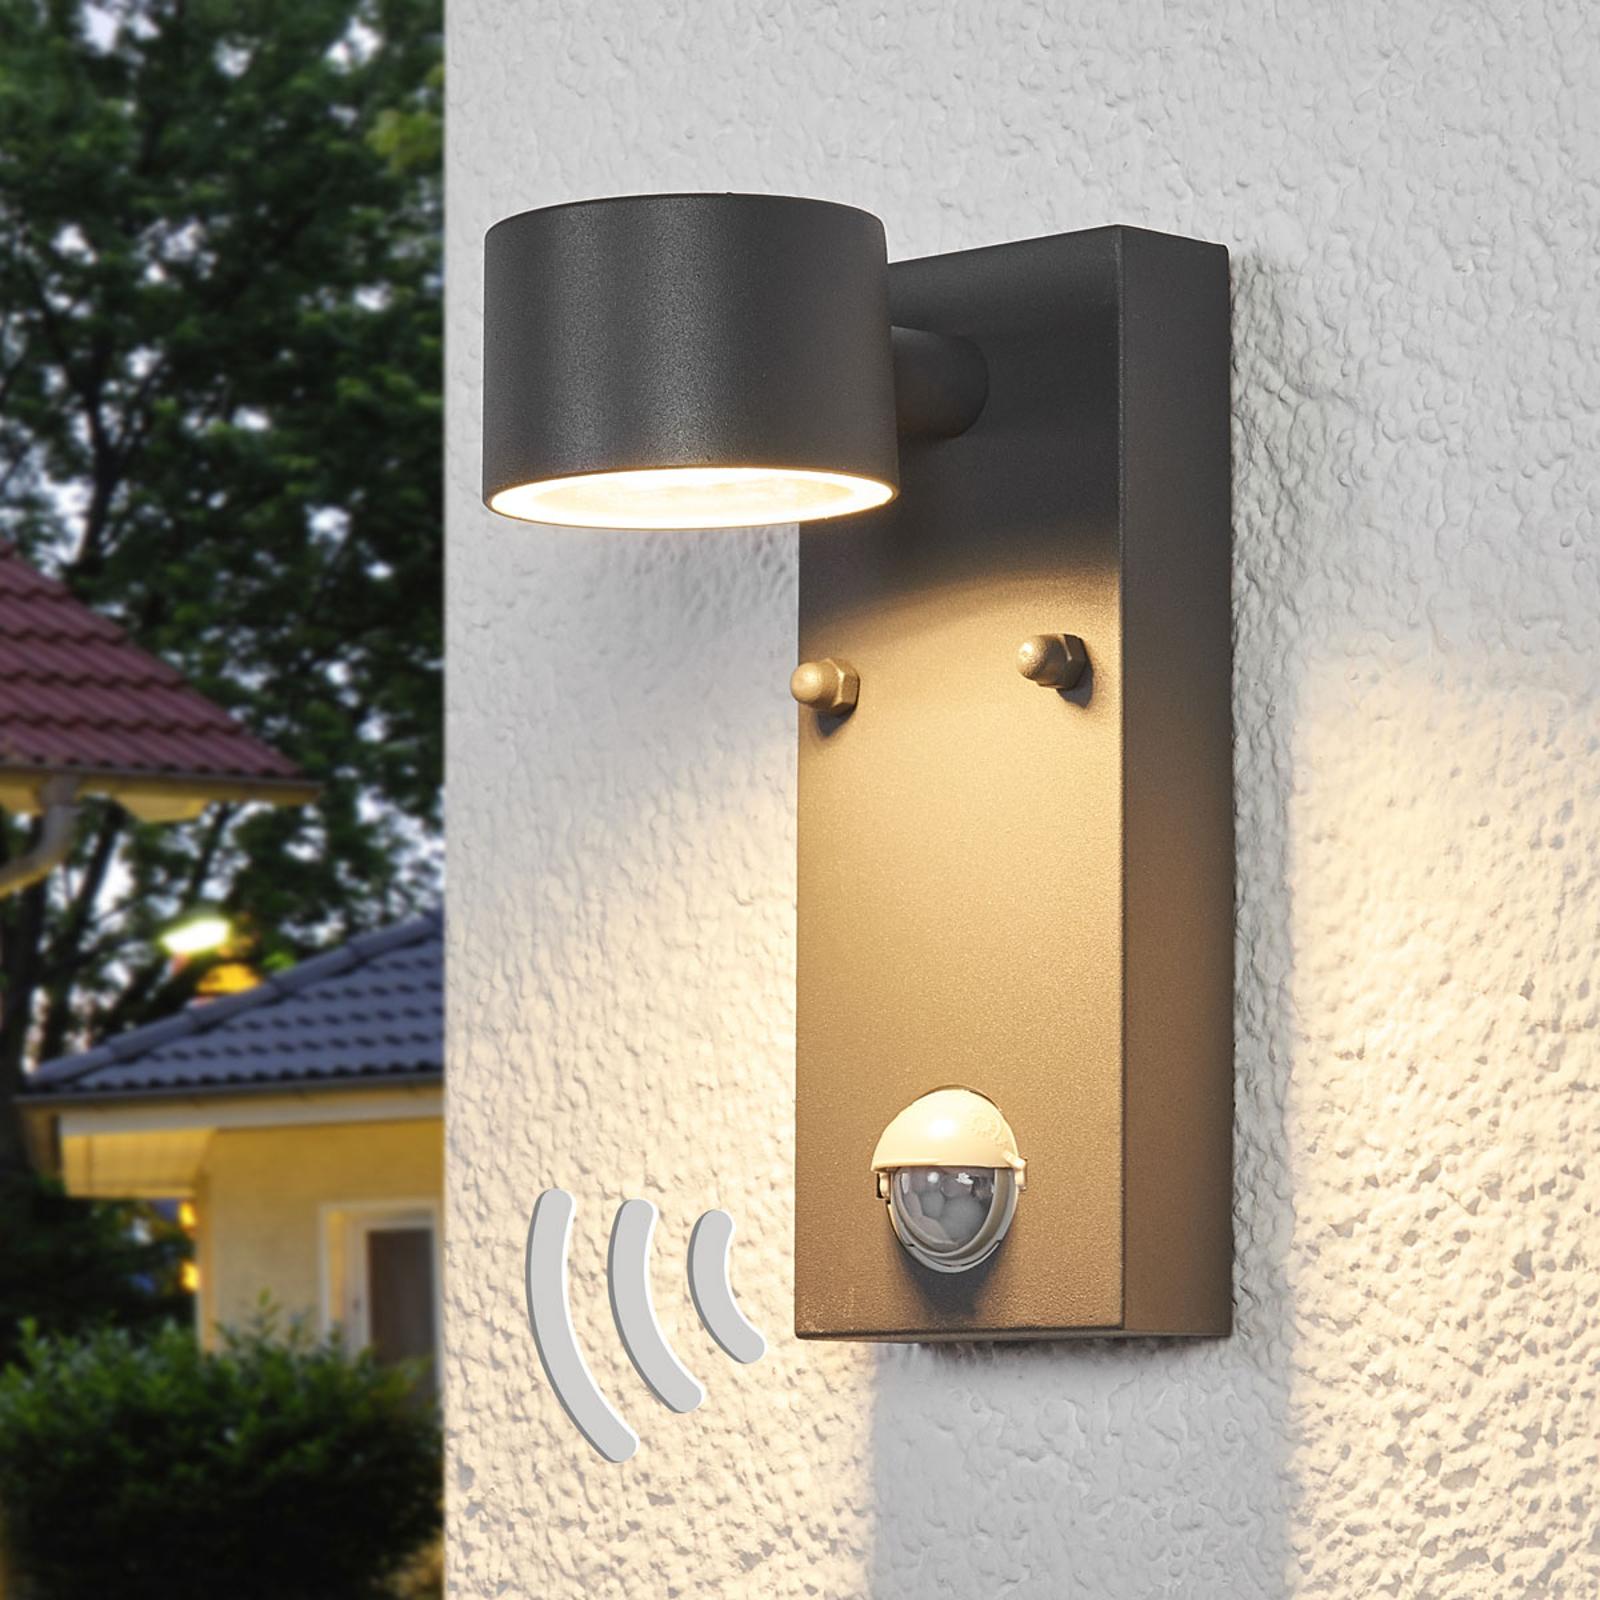 Buitenwandlamp Lexi met LED's en sensor